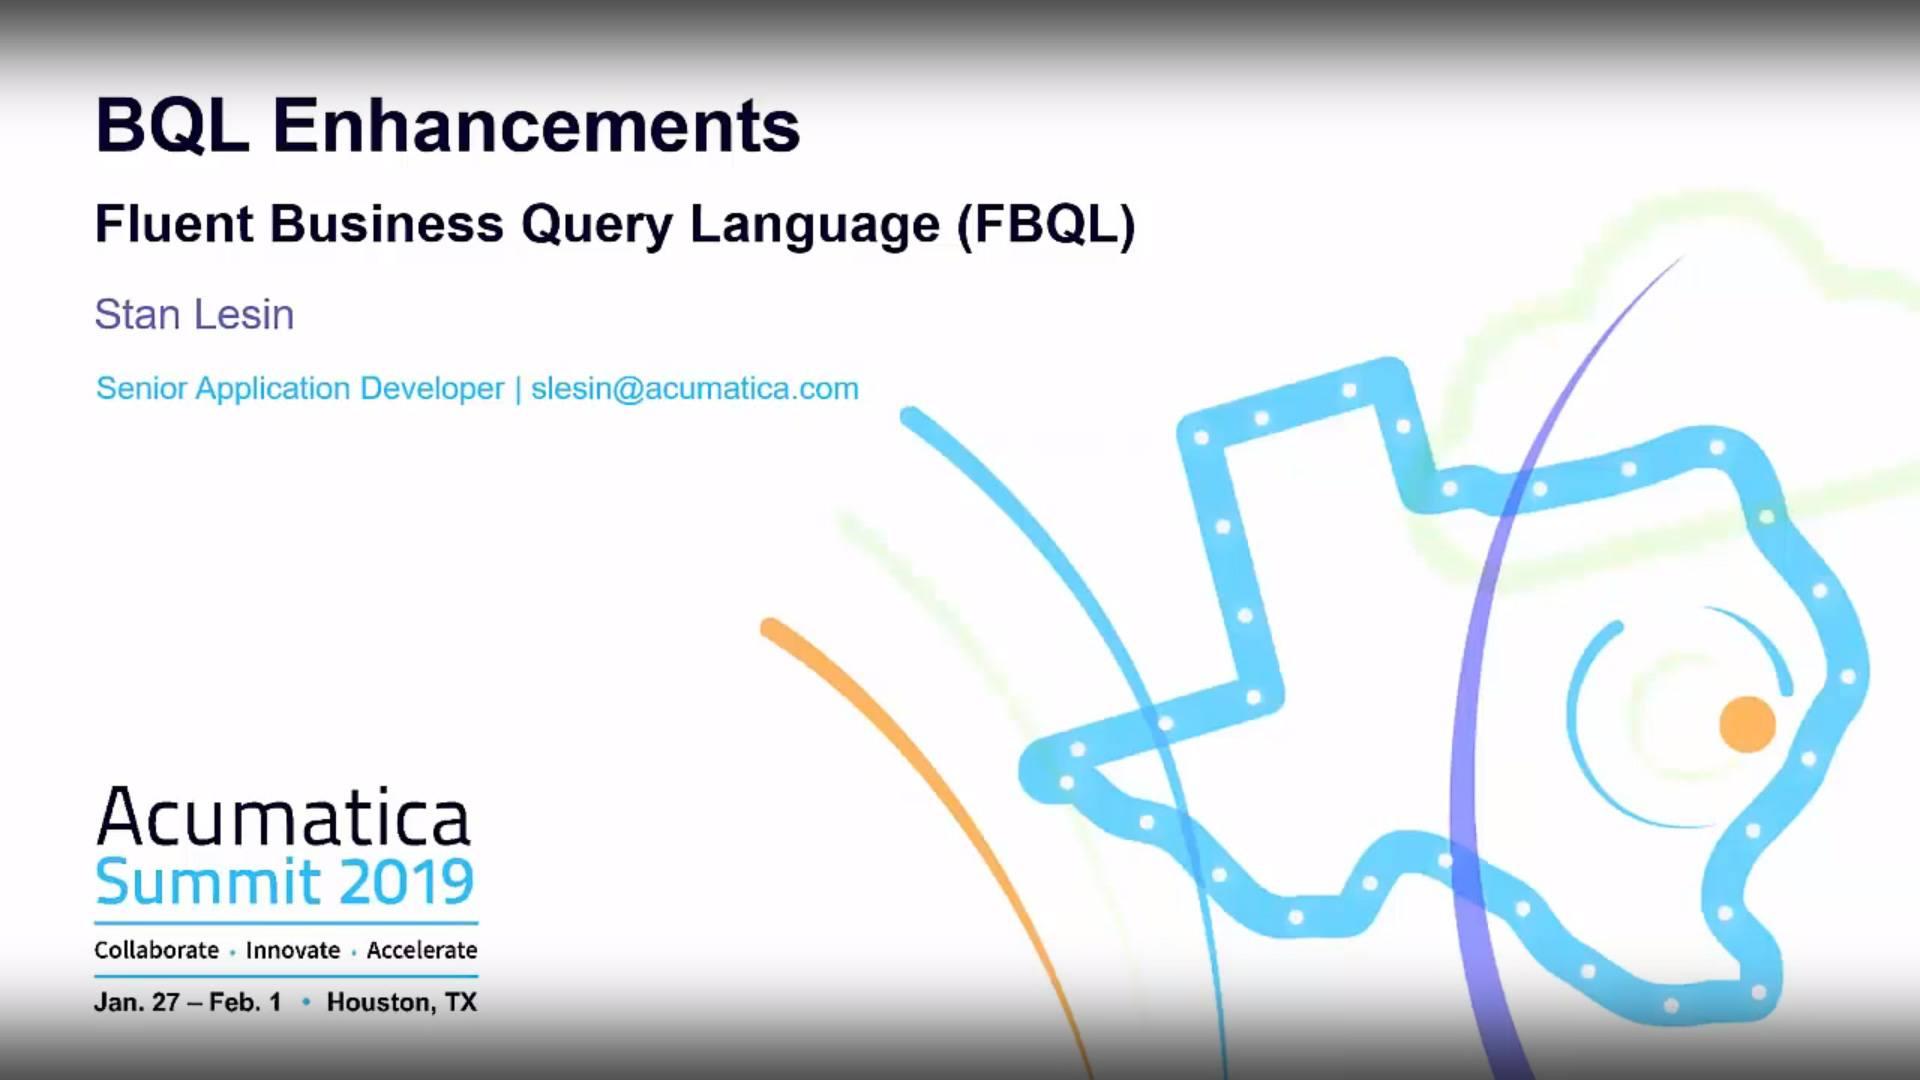 Acumatica Developer Webinar Series: BQL Enhancements